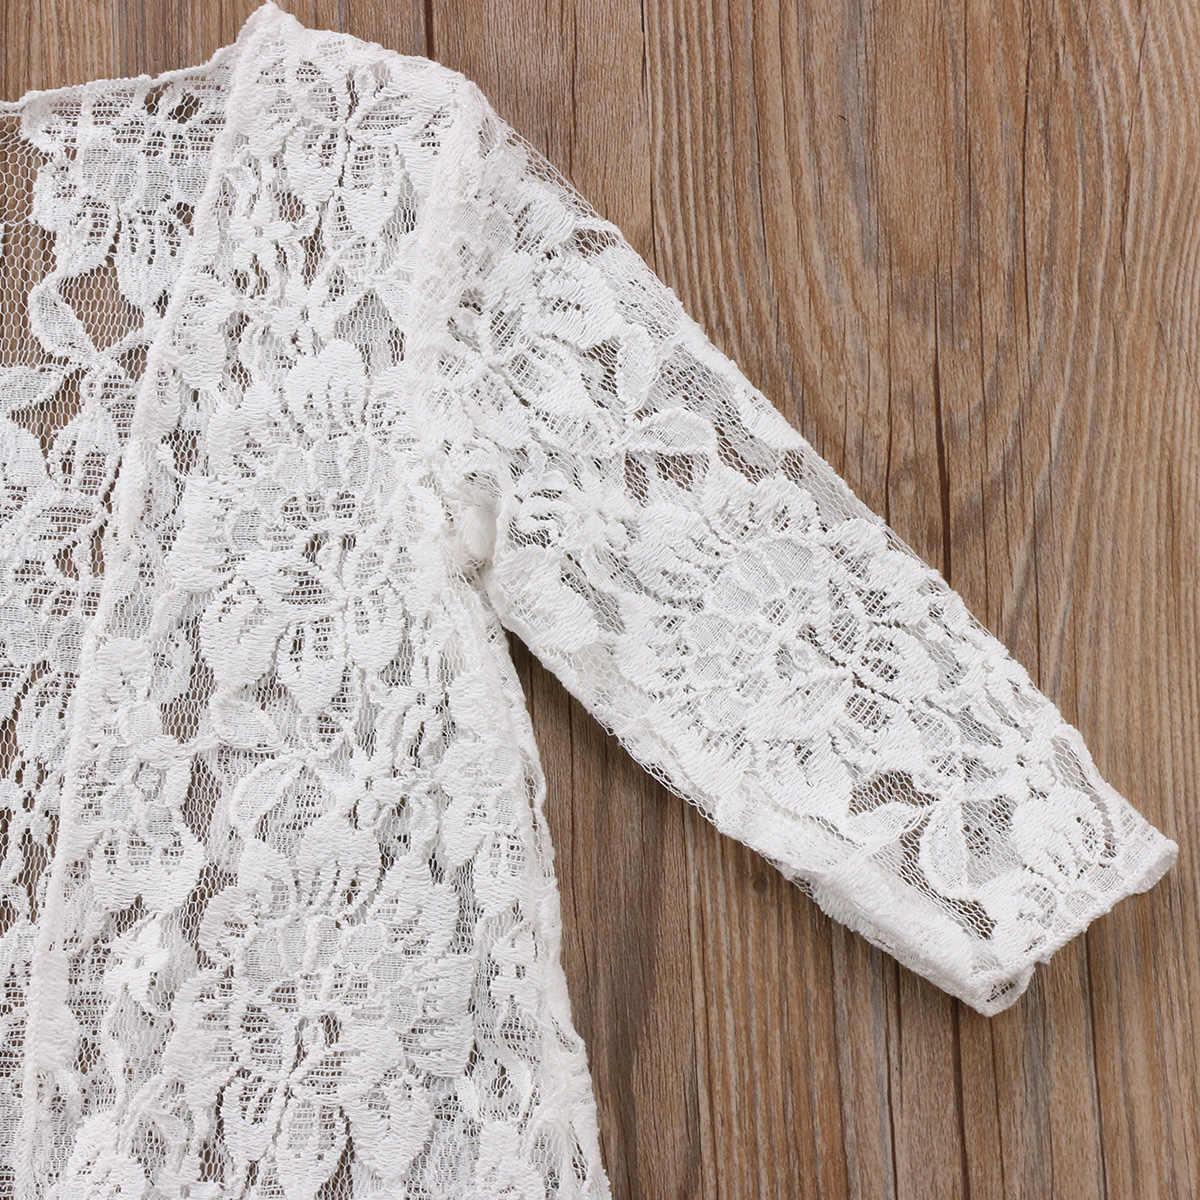 Fashion Anak-anak Bayi Perempuan Renda Bunga tabir surya Renda Putih Lengan Panjang Gaun Rashguard Pakaian Pakaian Luar Parit